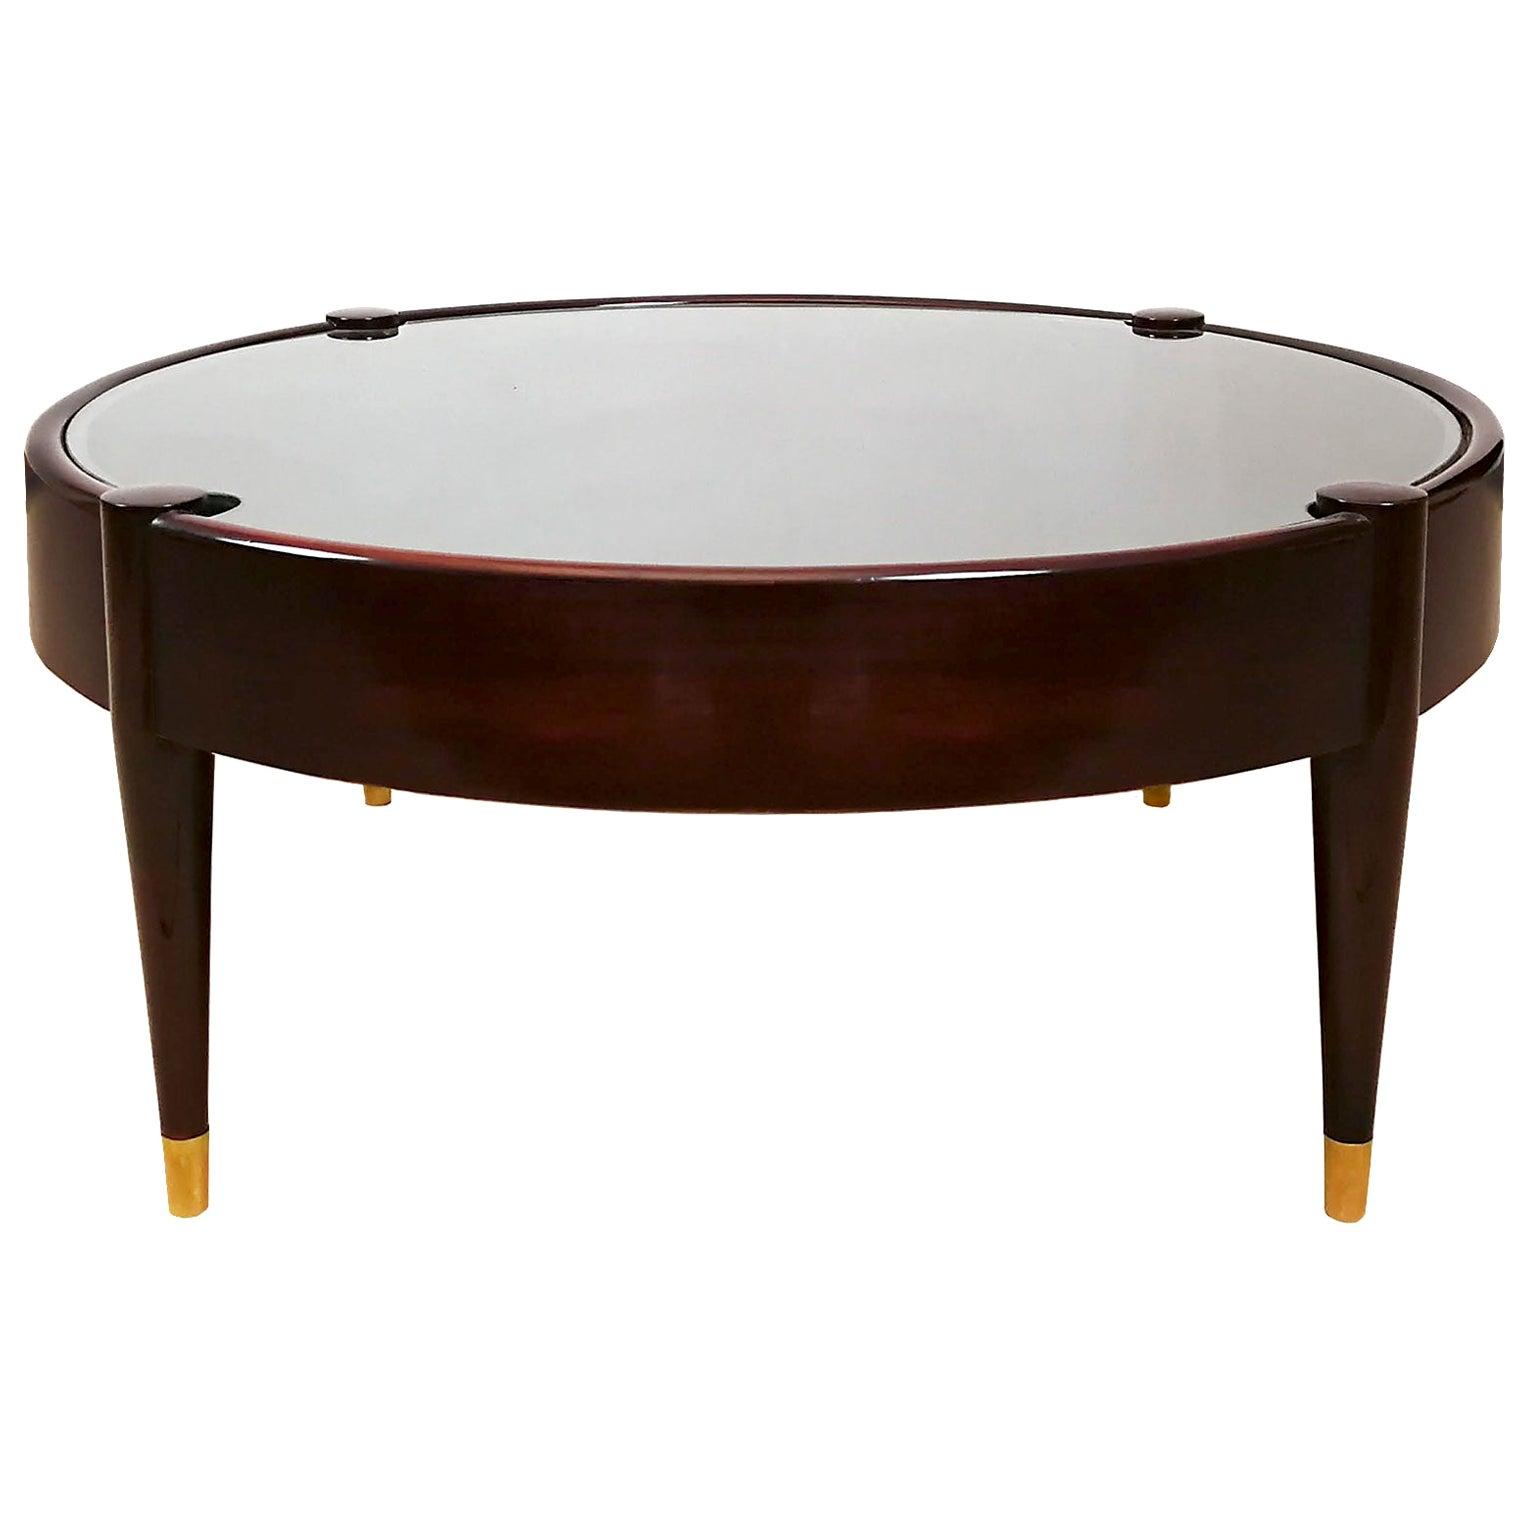 1960s Round Vitrine-Coffee Table by Jordi Vilanova, Walnut, Leather, Barcelona